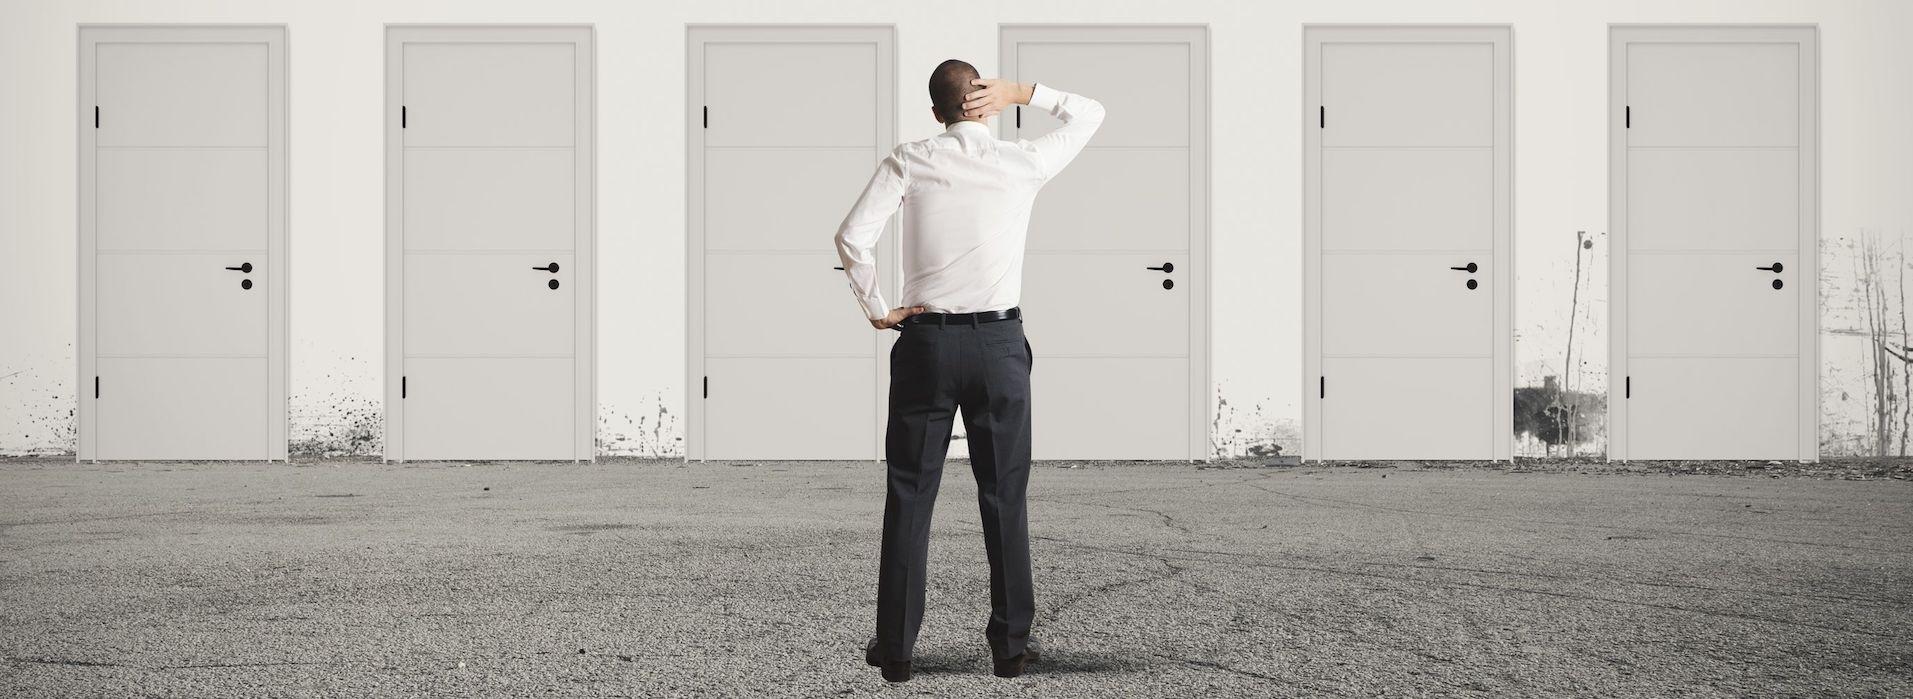 Dilemma-der-Personalisierung-Keyvisual